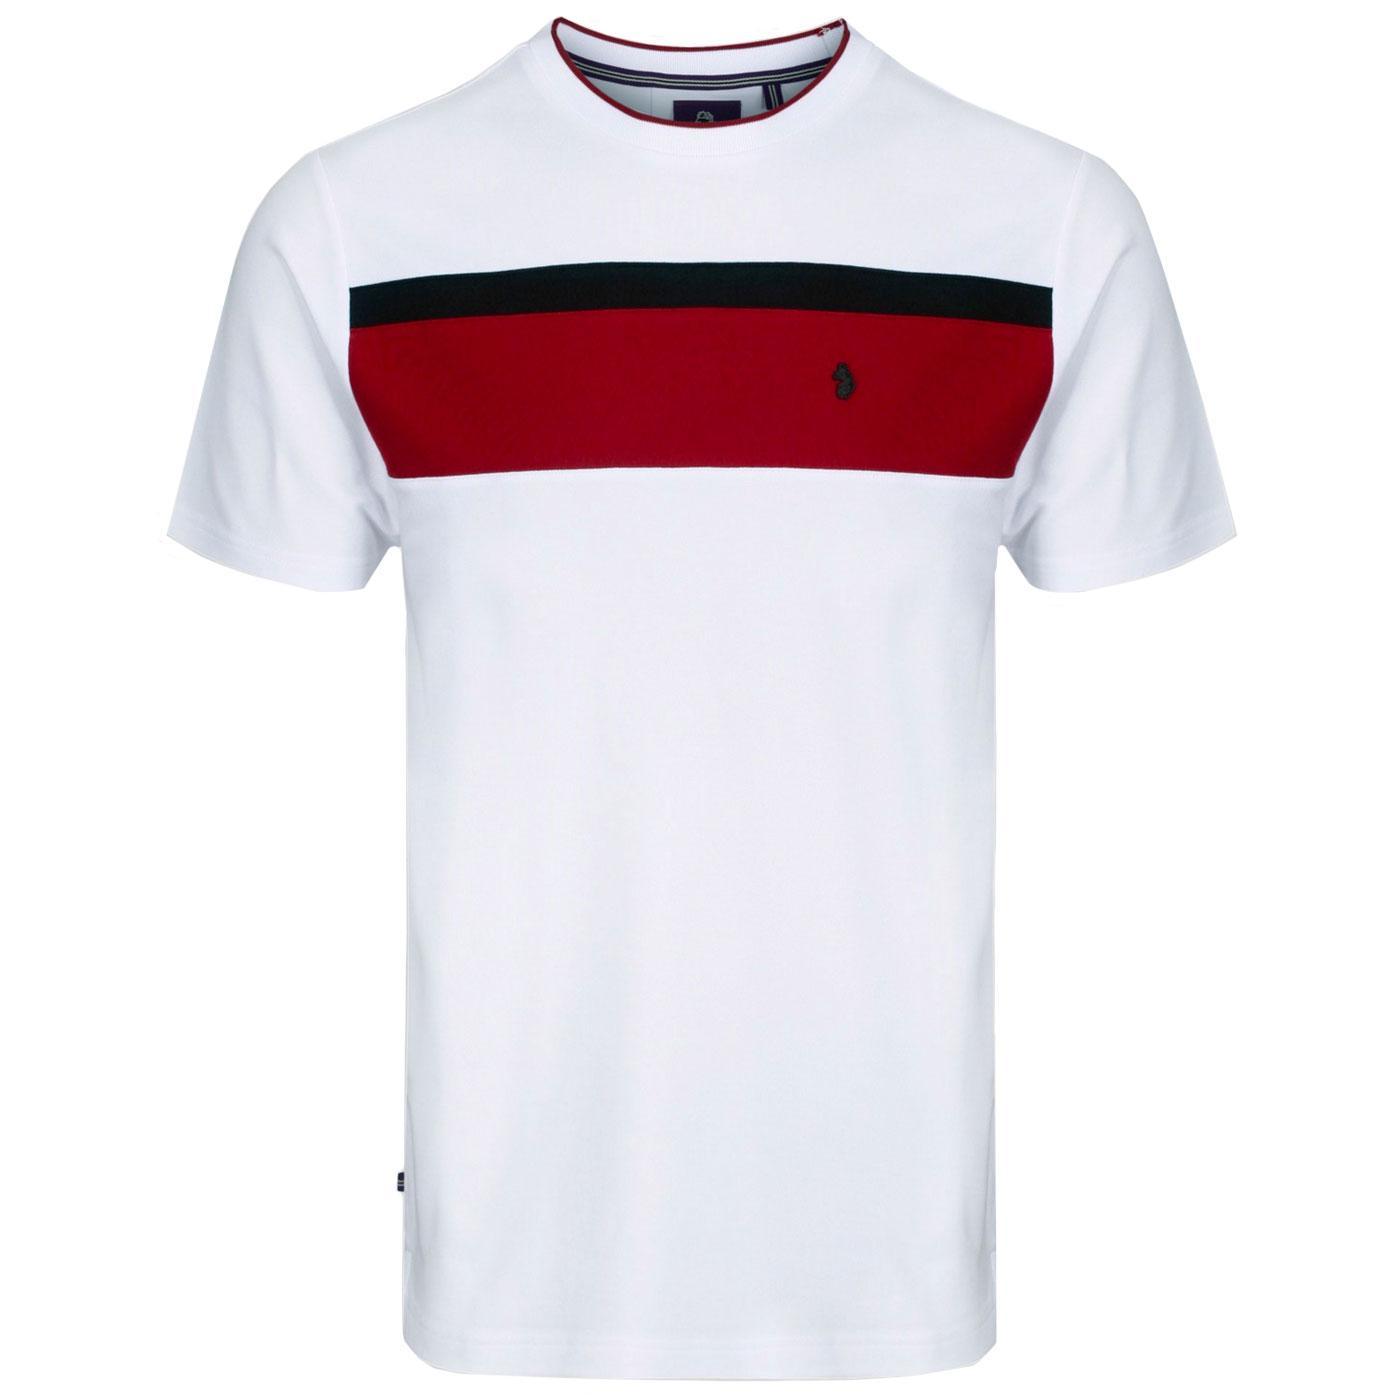 Indy Nial LUKE Men's Retro Pique Cotton T-Shirt W